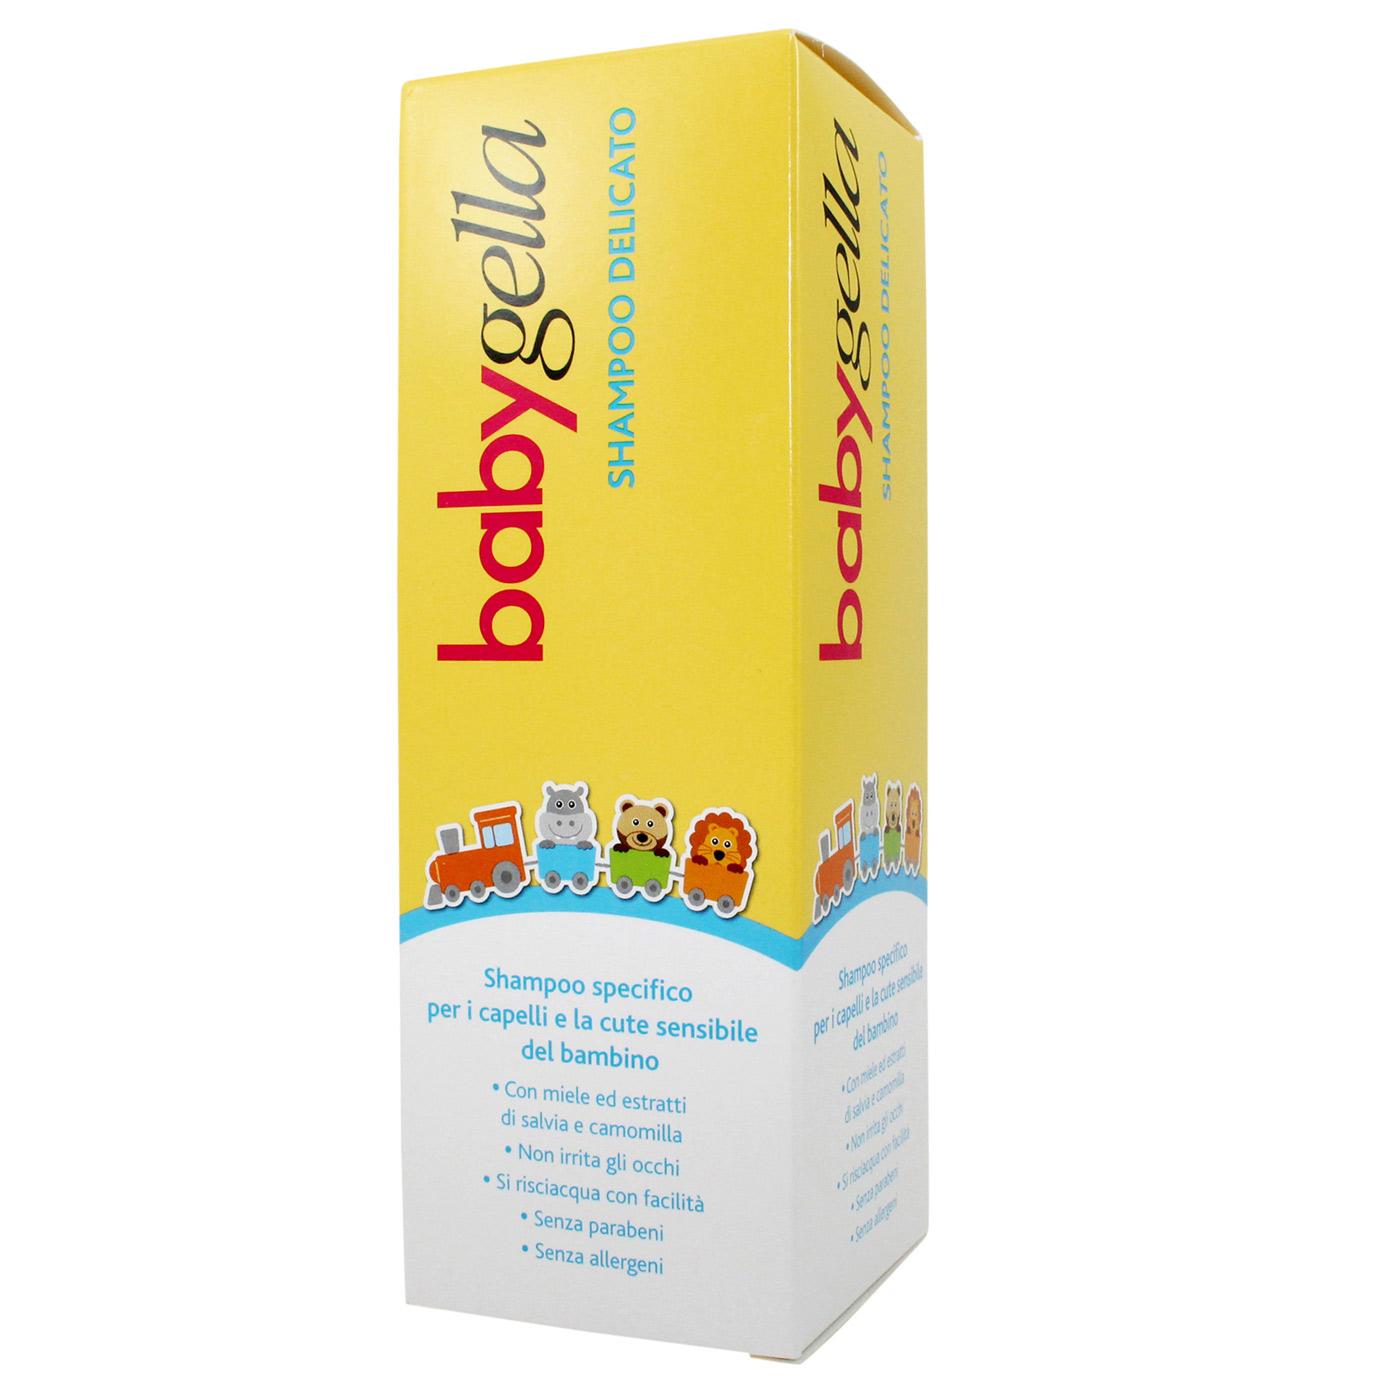 BABYGELLA SHAMPOO DELICATO FLACONE 250 ML - Farmacia33